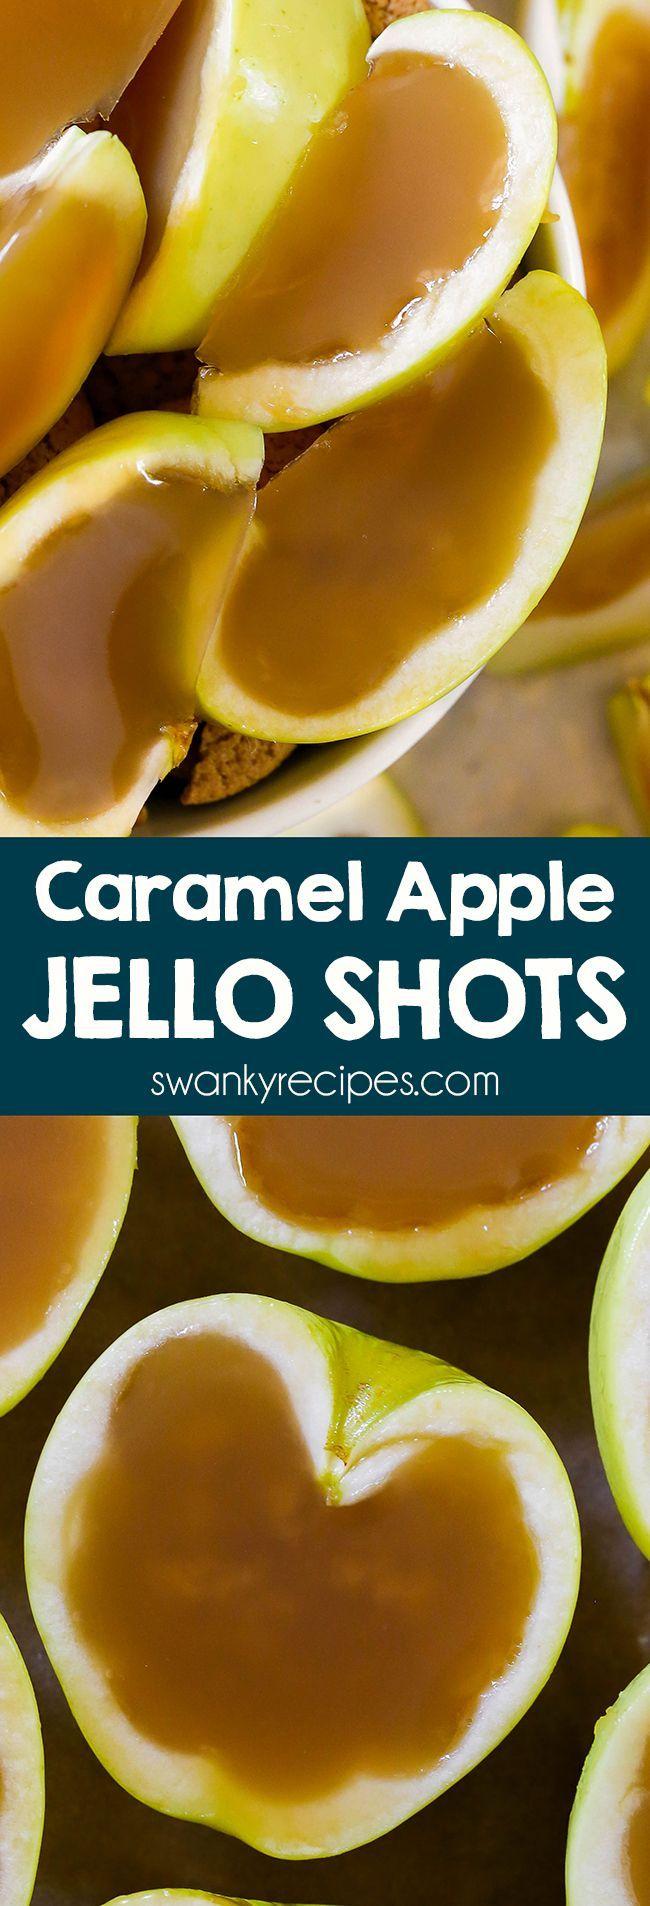 Caramel Apple Jello Shots - Boozy dessert jello shots. Apple cider, caramel vodka, caramel sauce, and gelatine fill apples. Friends always rave how fun these Caramel Apple Jello Shots are for a Halloween party!  #jelloshots #jelloshots